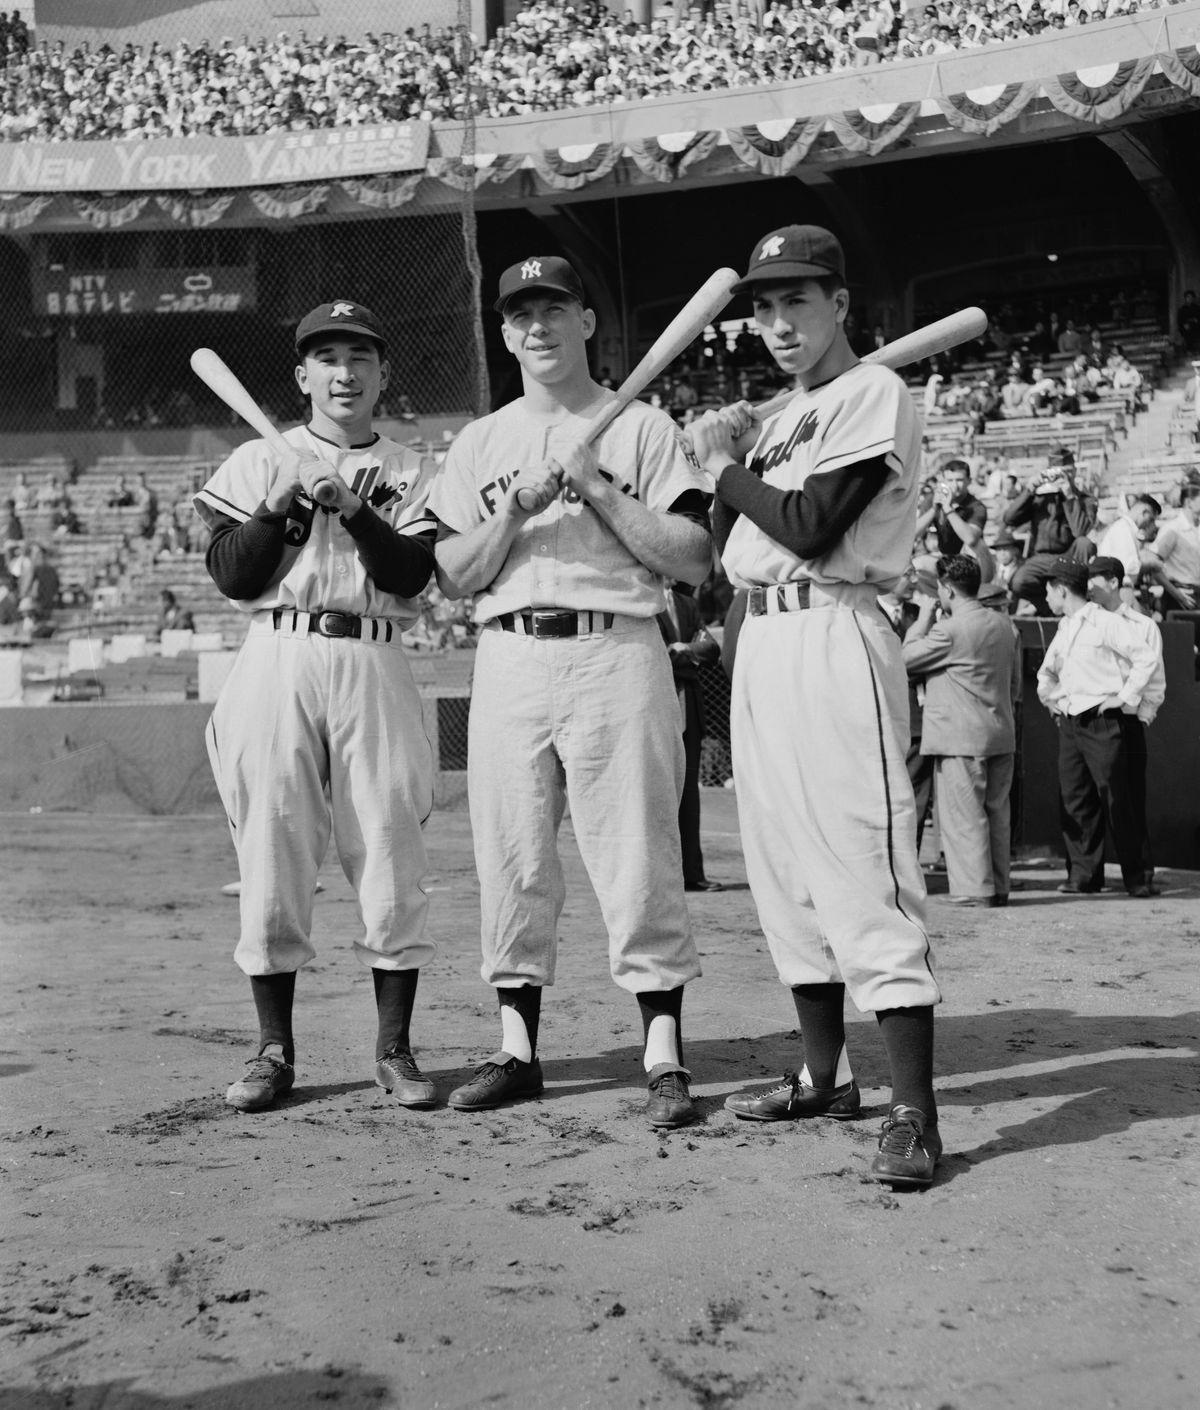 Japanese Baseball Players Posing with Bats